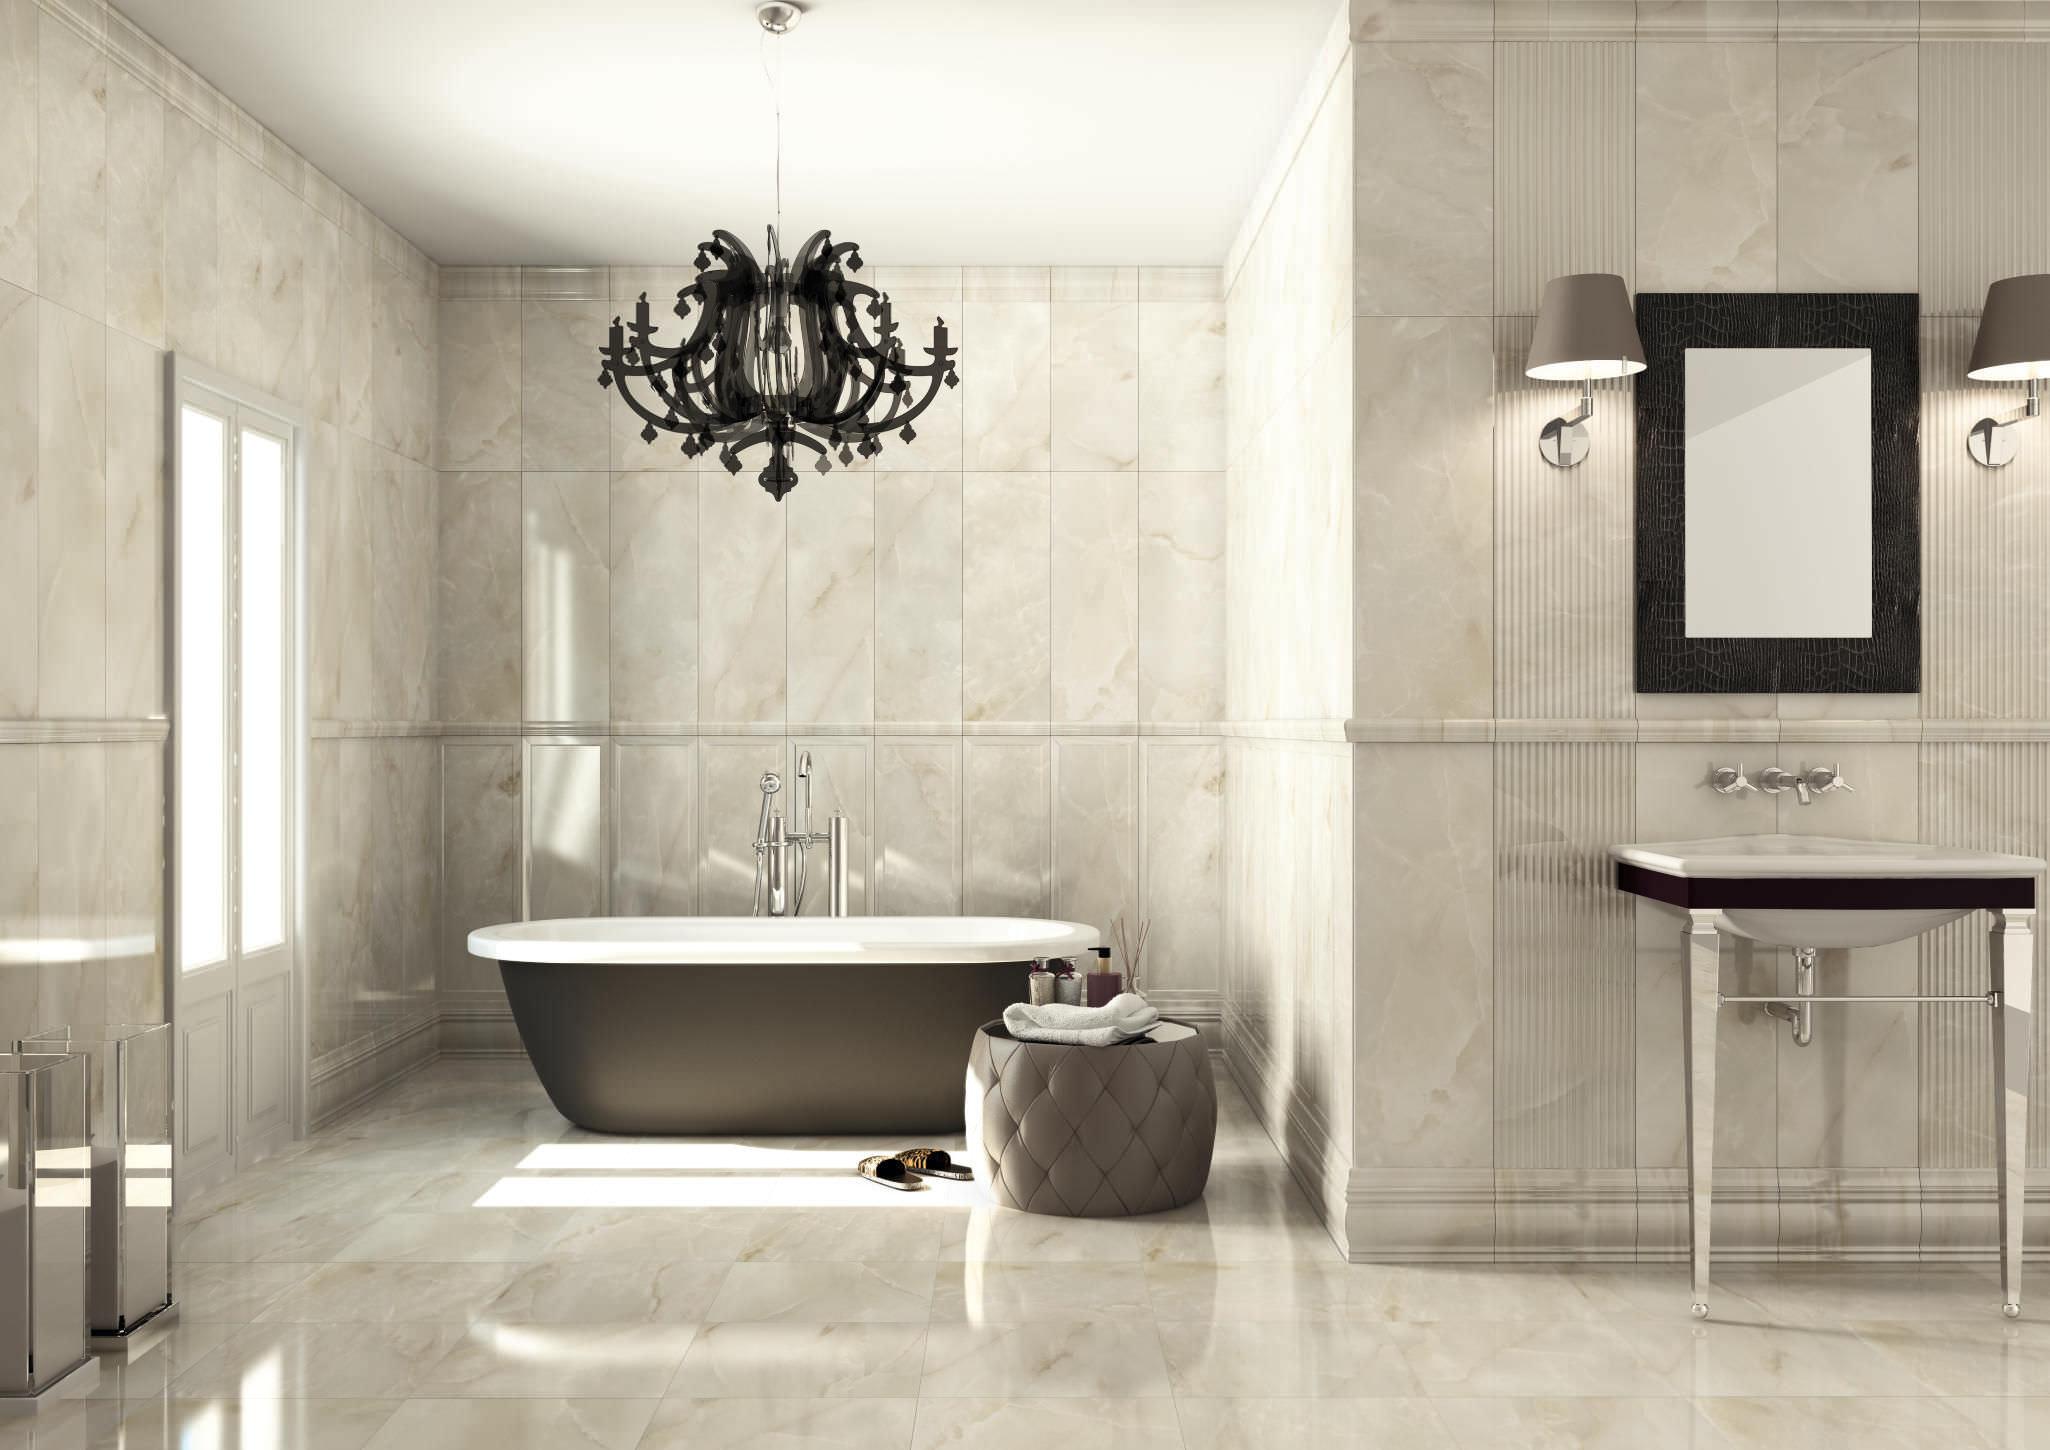 mosaic-gloss-granite-bathroom-floor-tile-ideas-free-sting-bath-223414